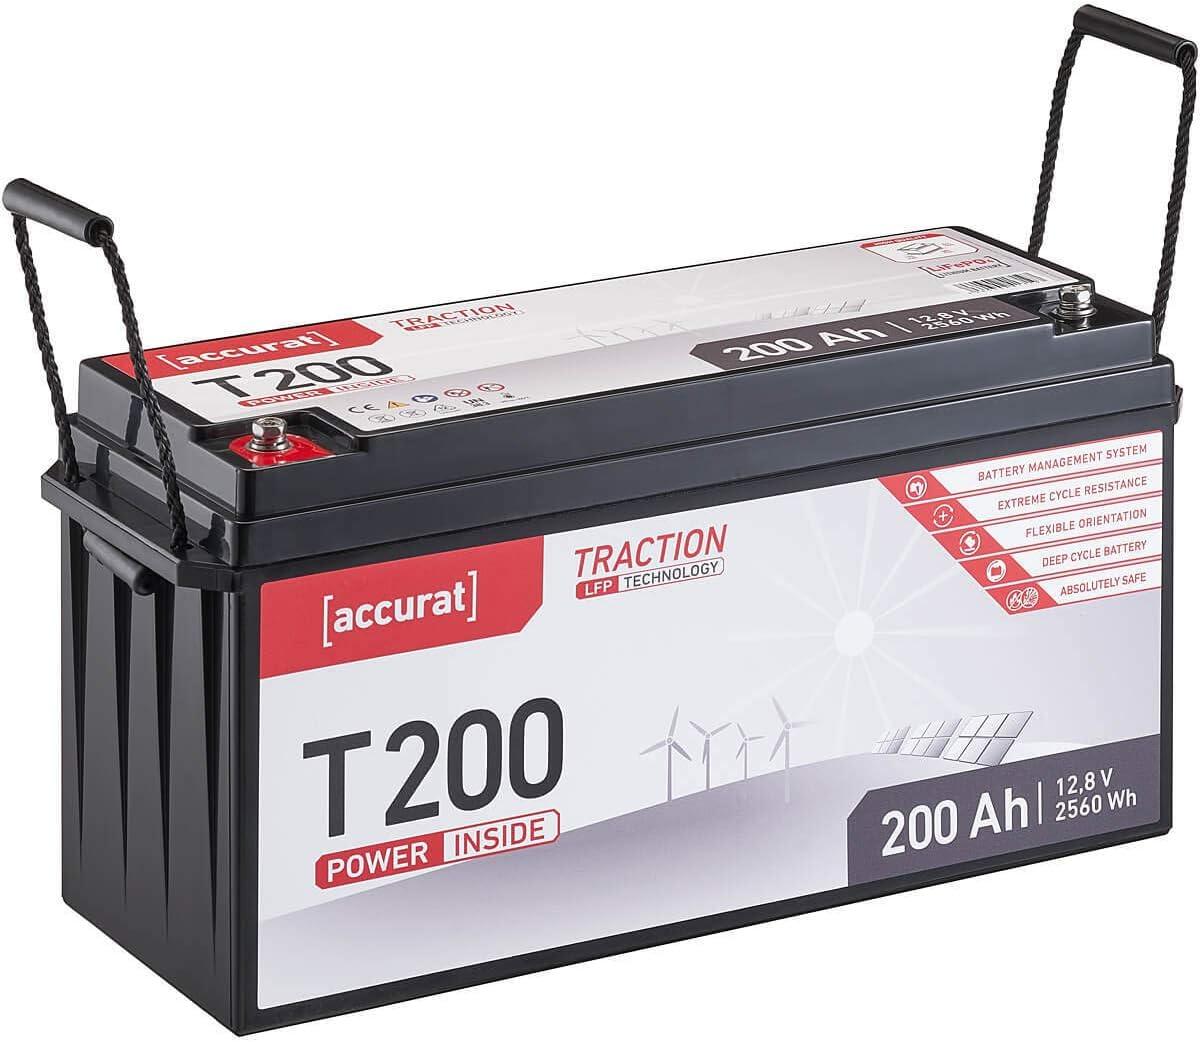 Accurat Traction 12V 12Ah LiFePO4 Lithium-Eisenphosphat Versorgungs-Batterie T12 LFP